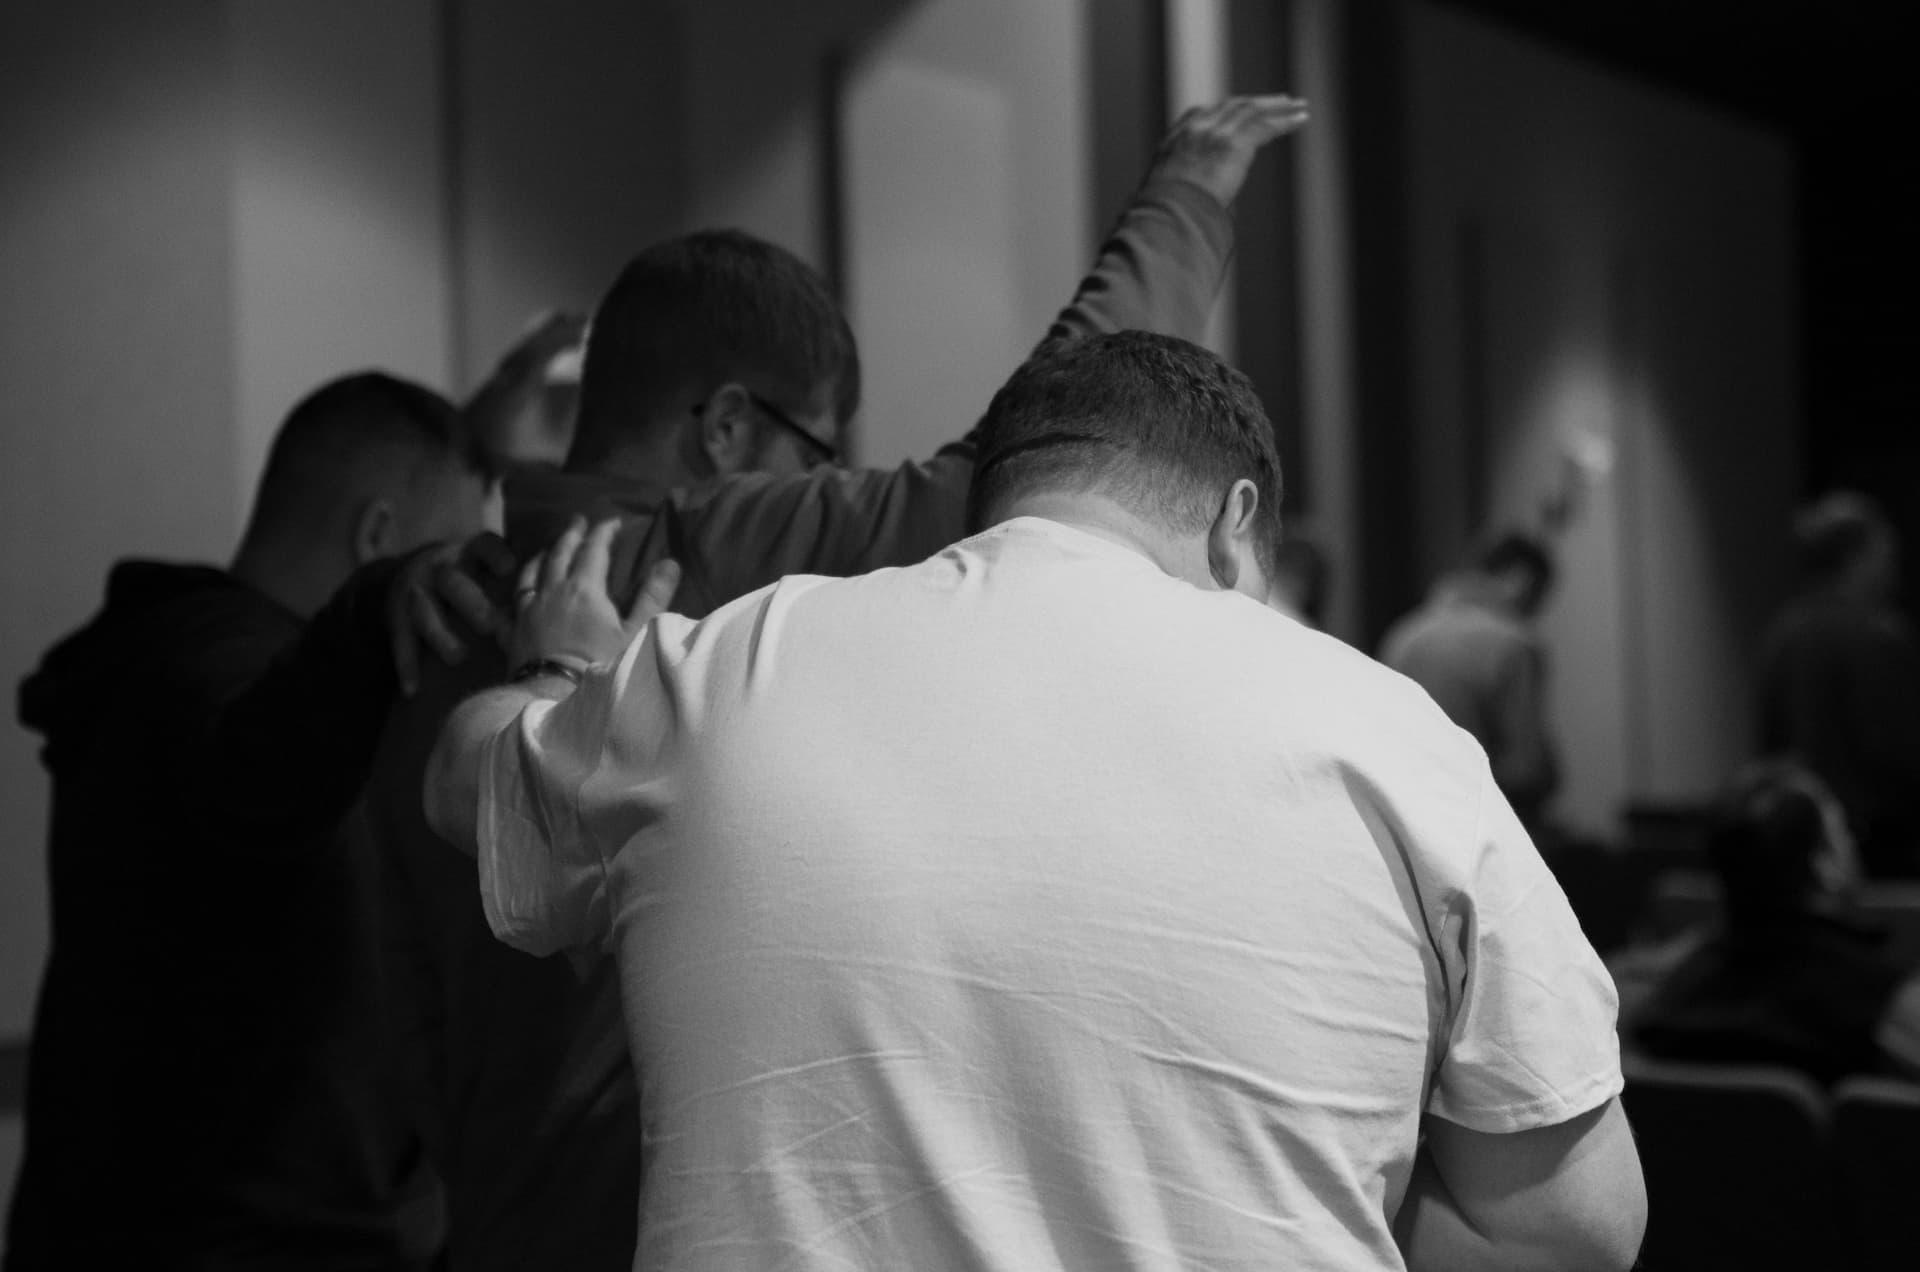 Men praying for each other while worshipping Jesus